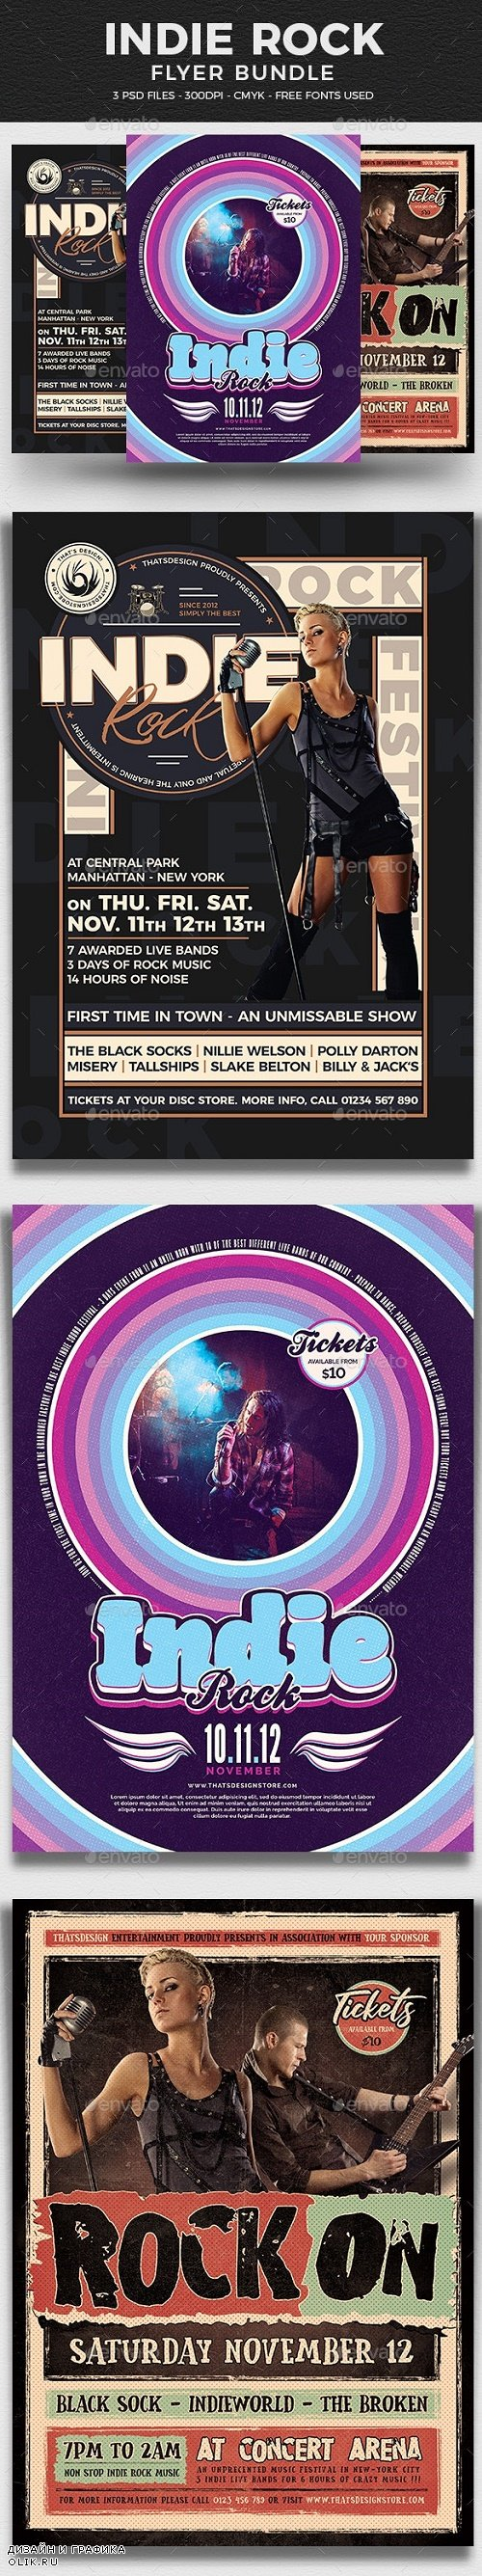 Indie Rock Flyer Bundle - 24920146 - 4240794